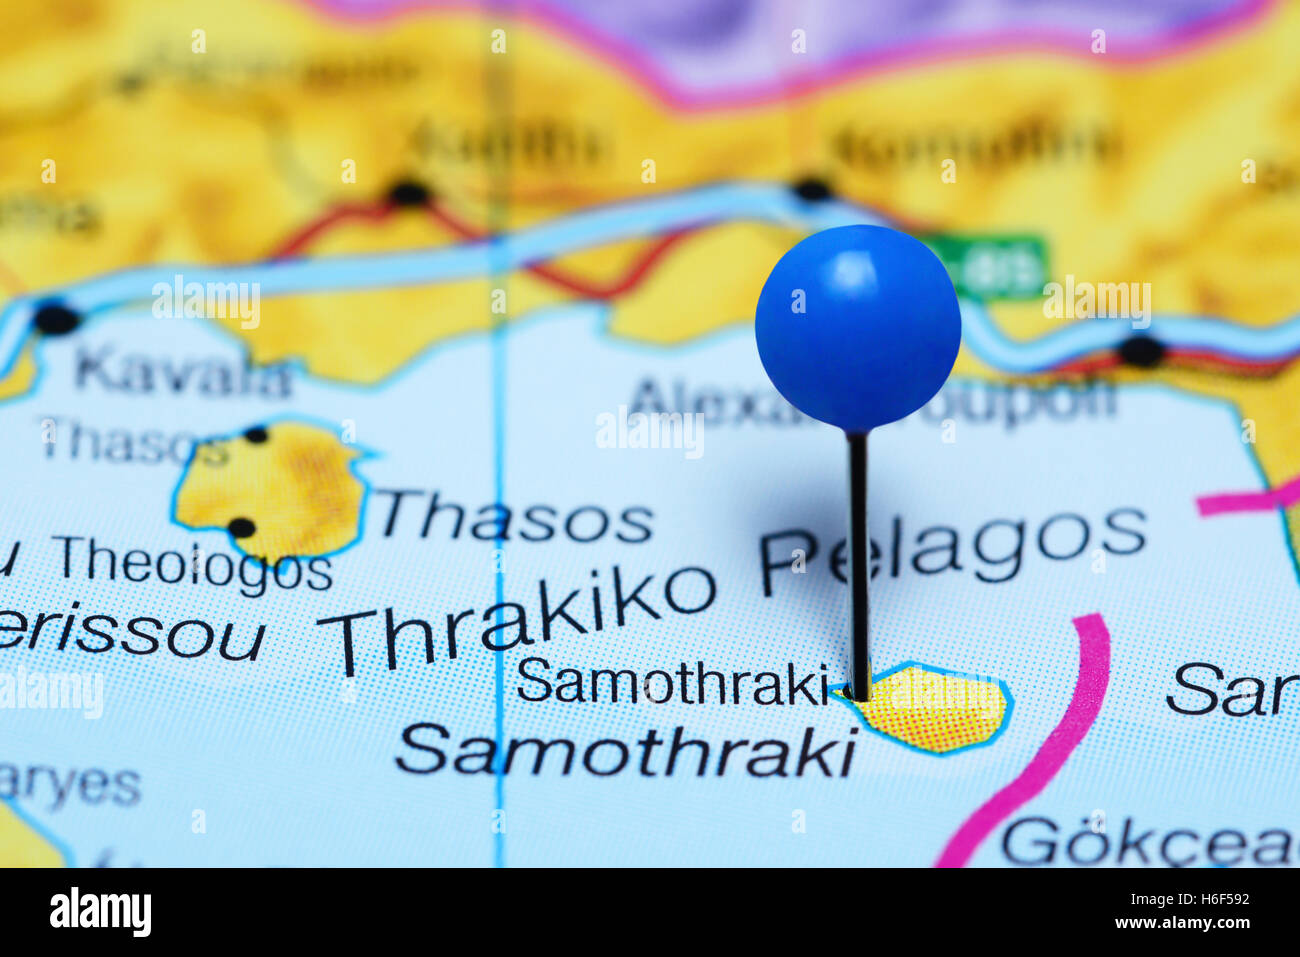 Samothraki Stock Photos Samothraki Stock Images Alamy